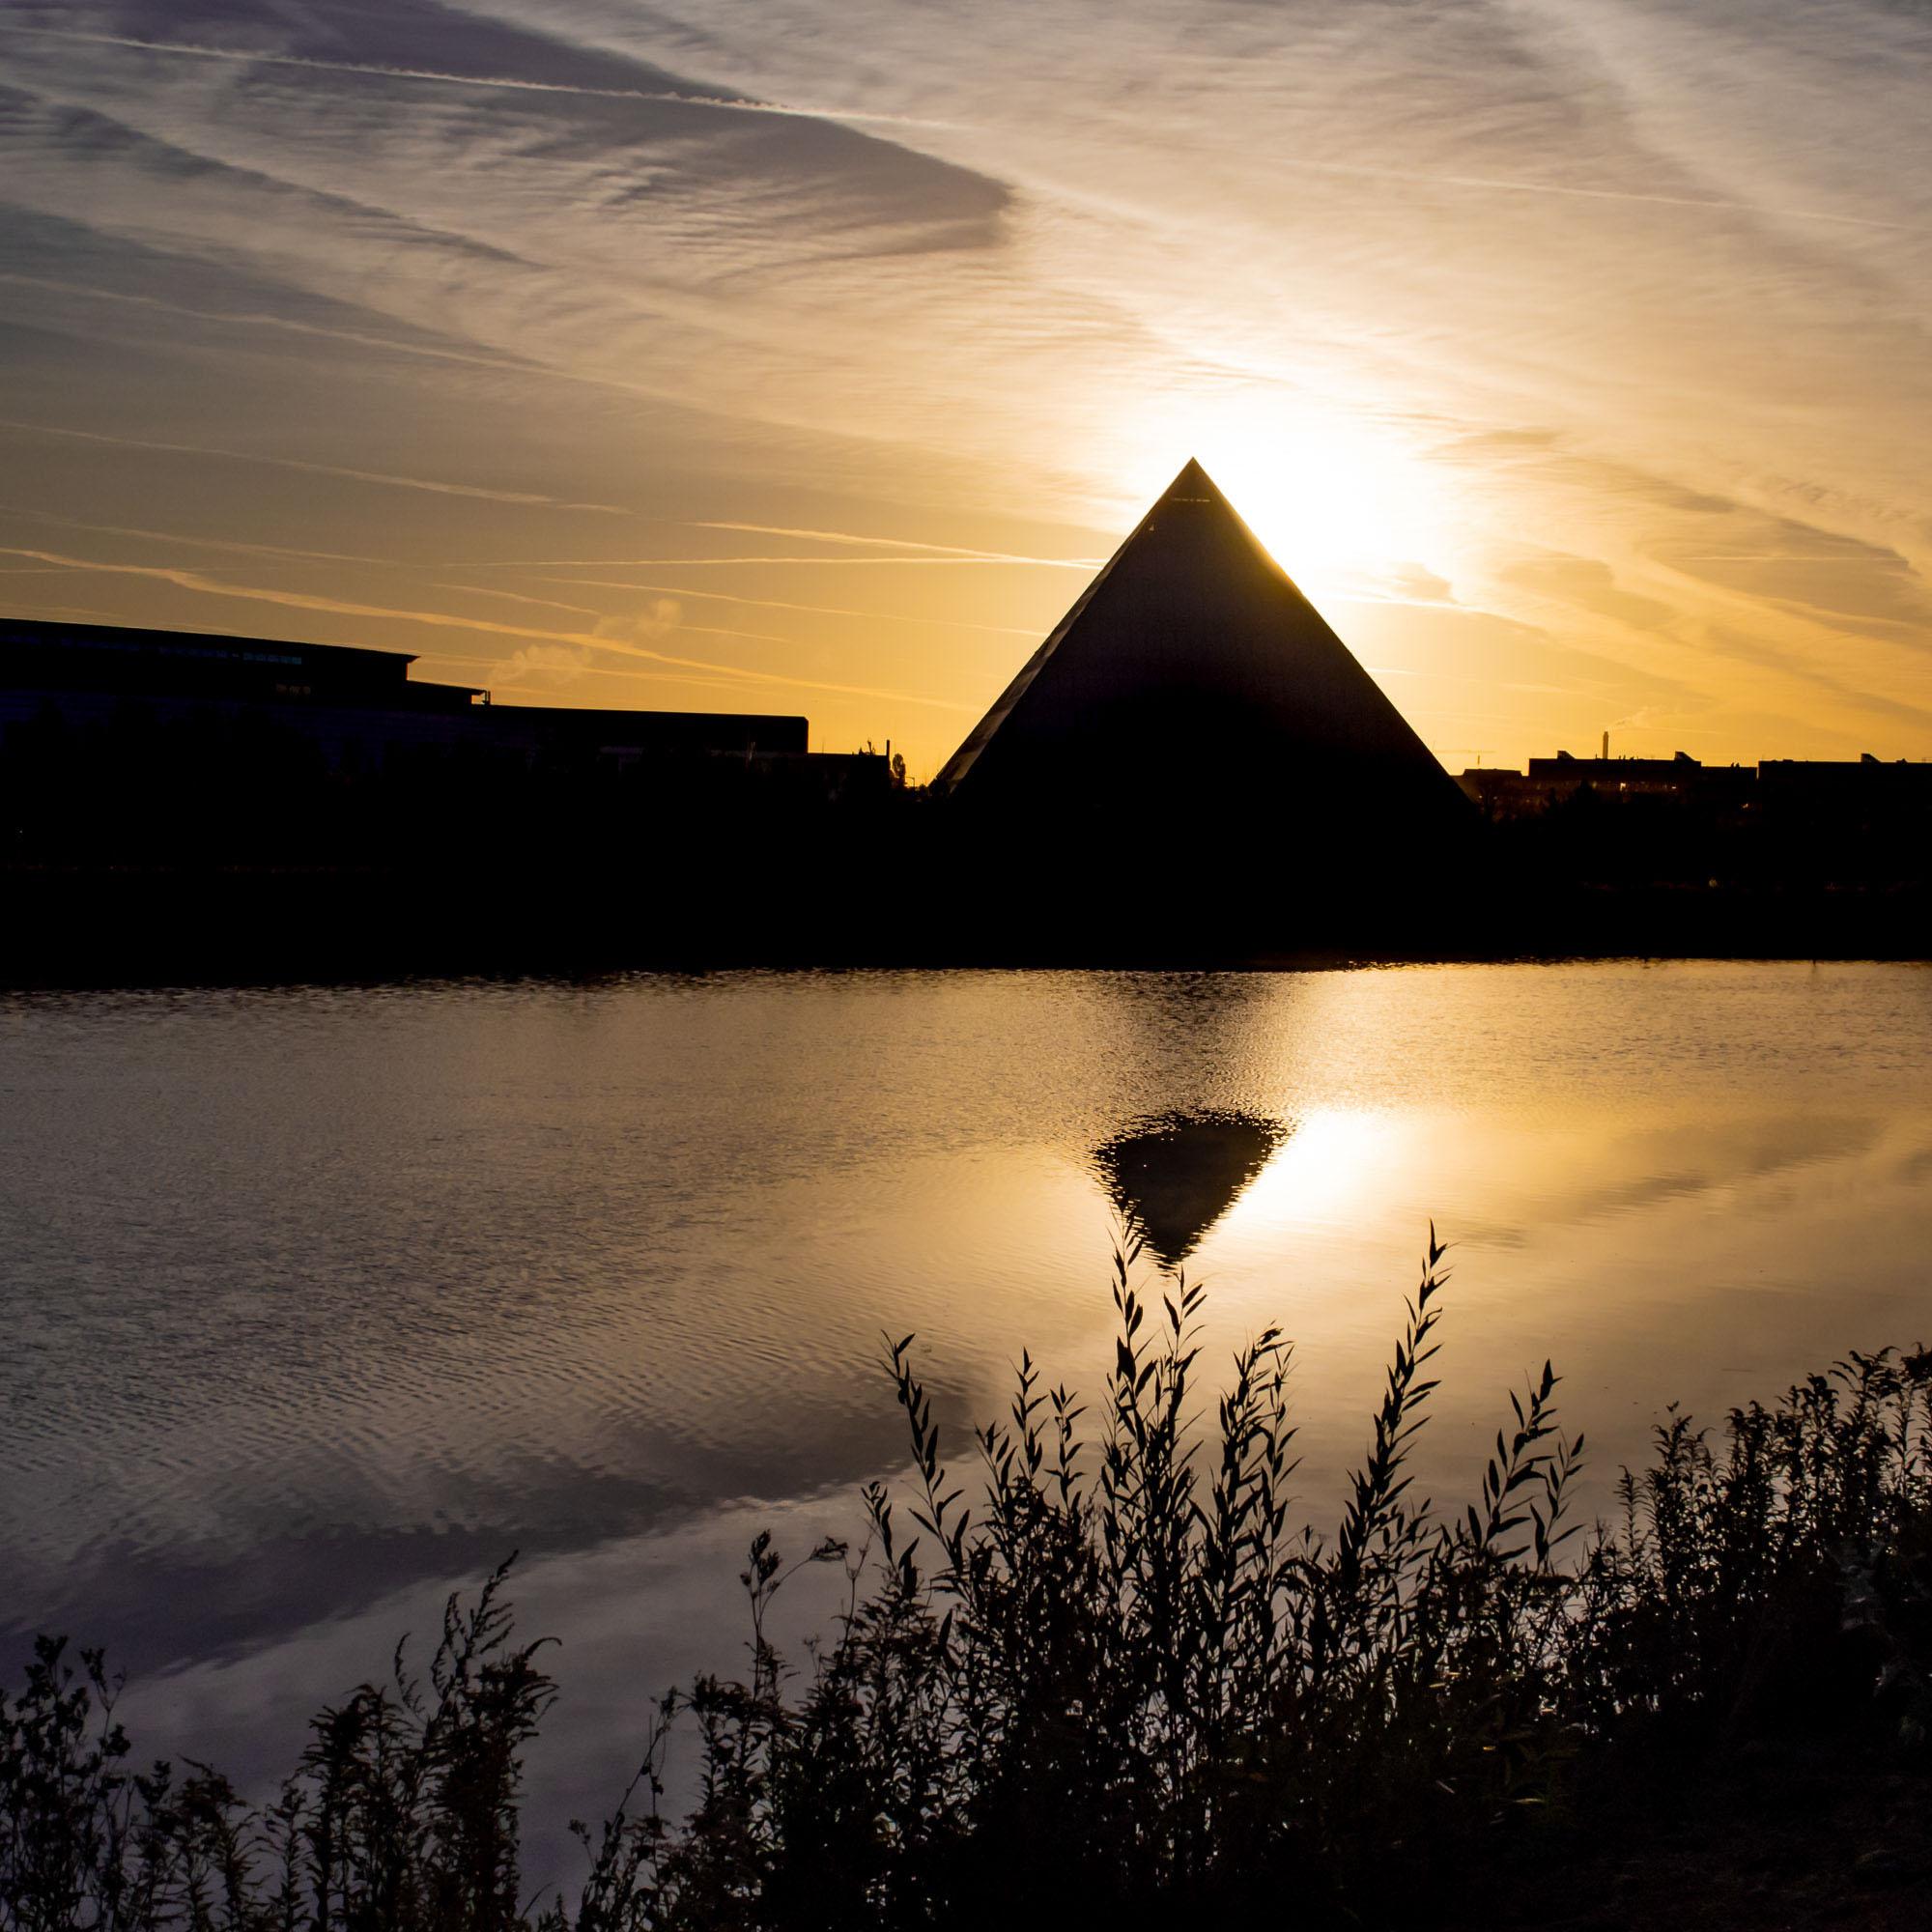 Cthulhusnet / Pyramide